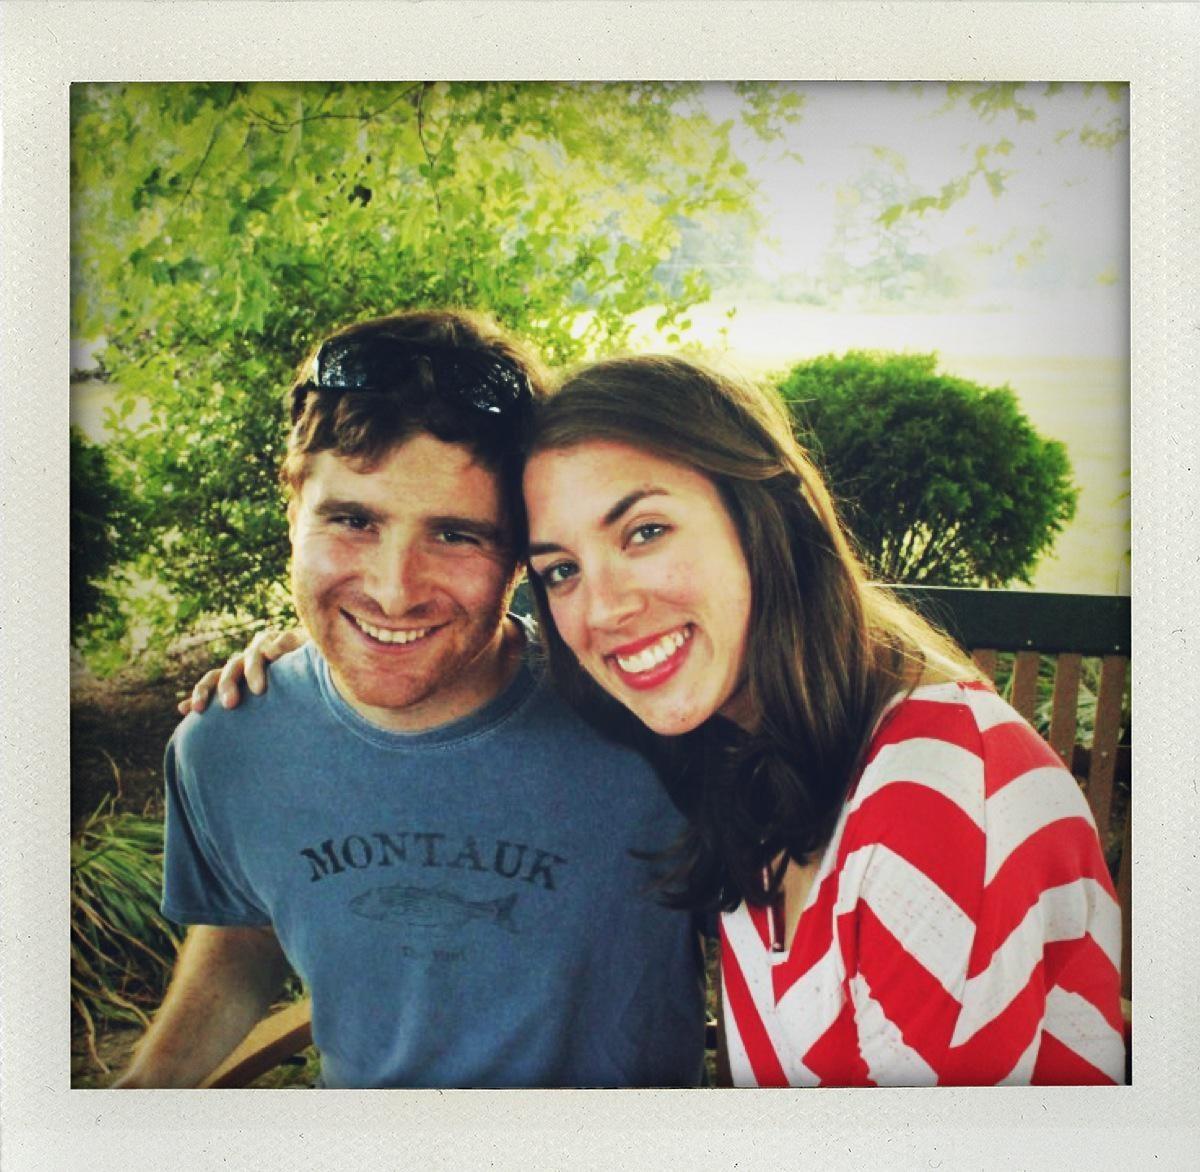 Jessica & Cory A.